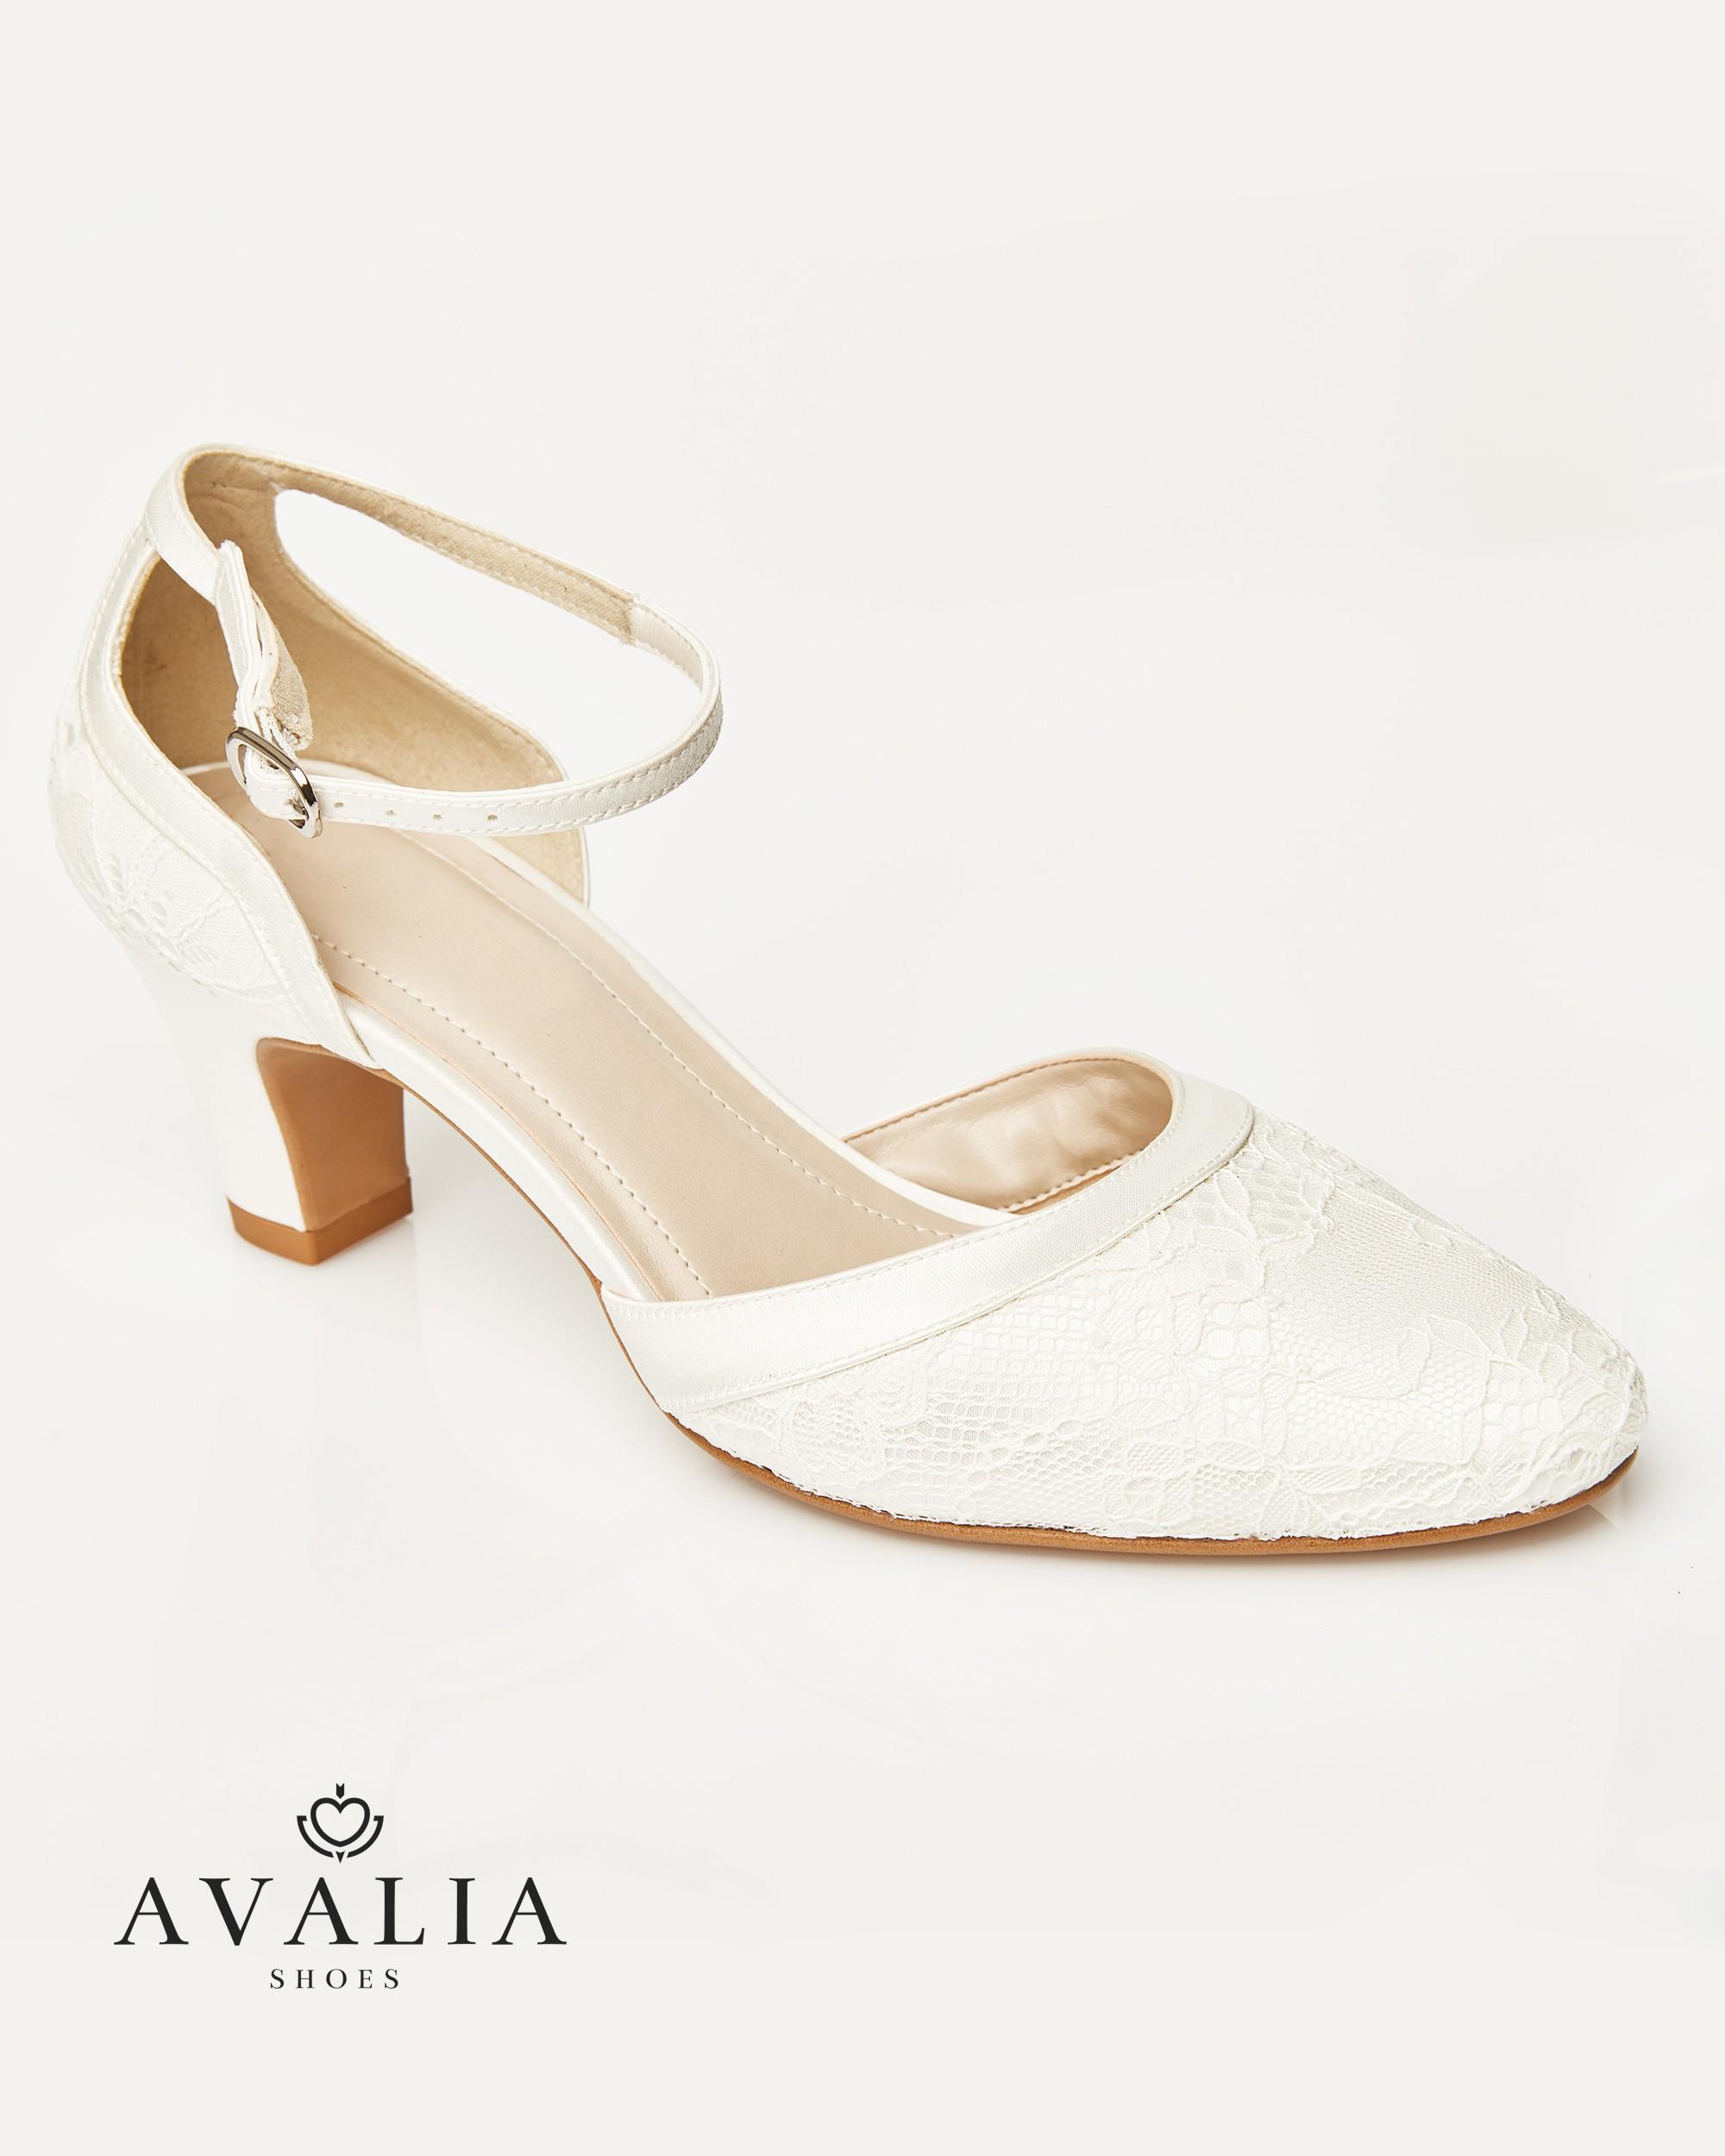 Chaussures talon 6 cm Kati